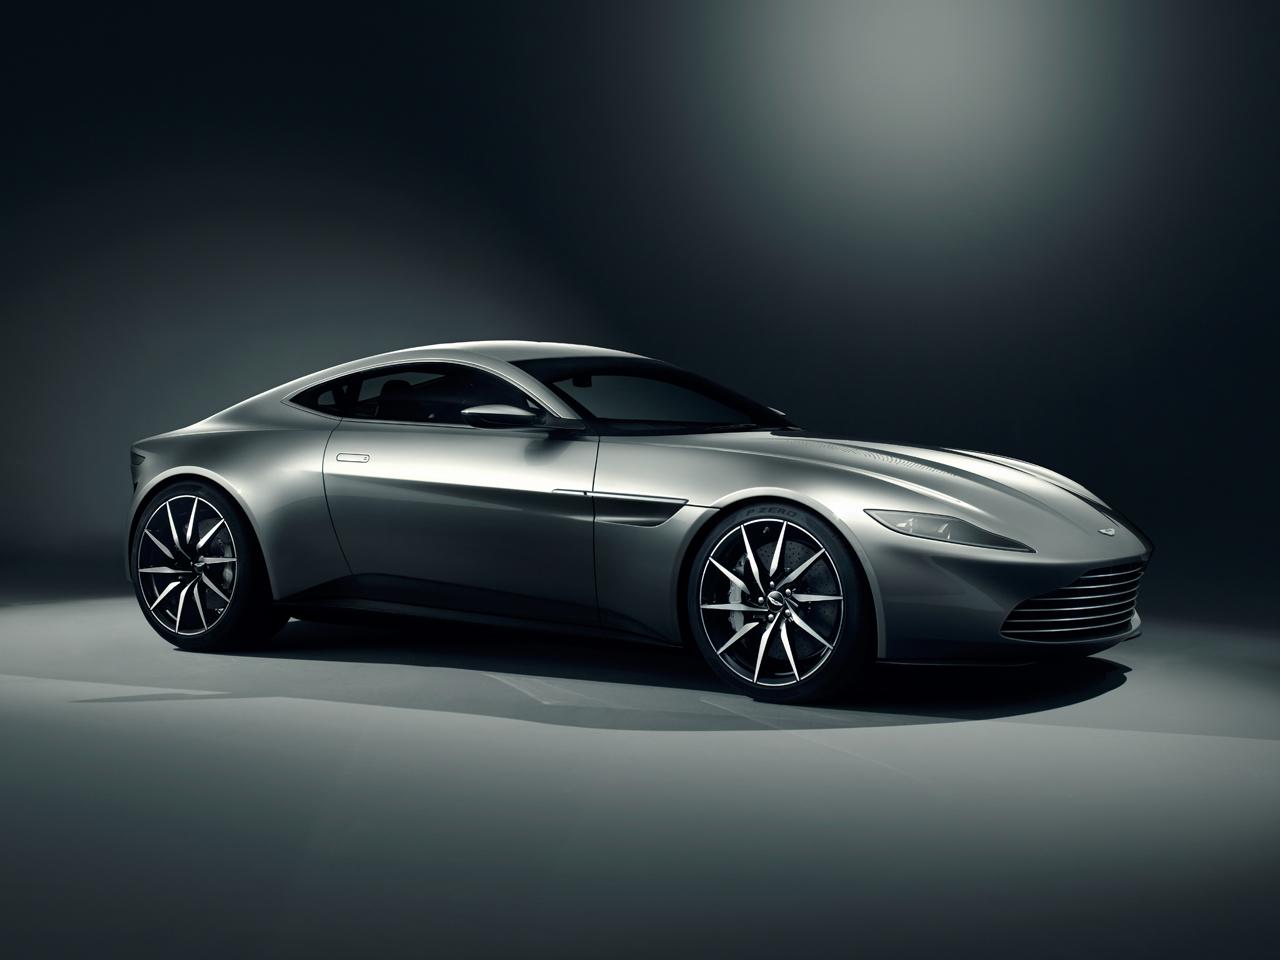 007 car aston martin db 10